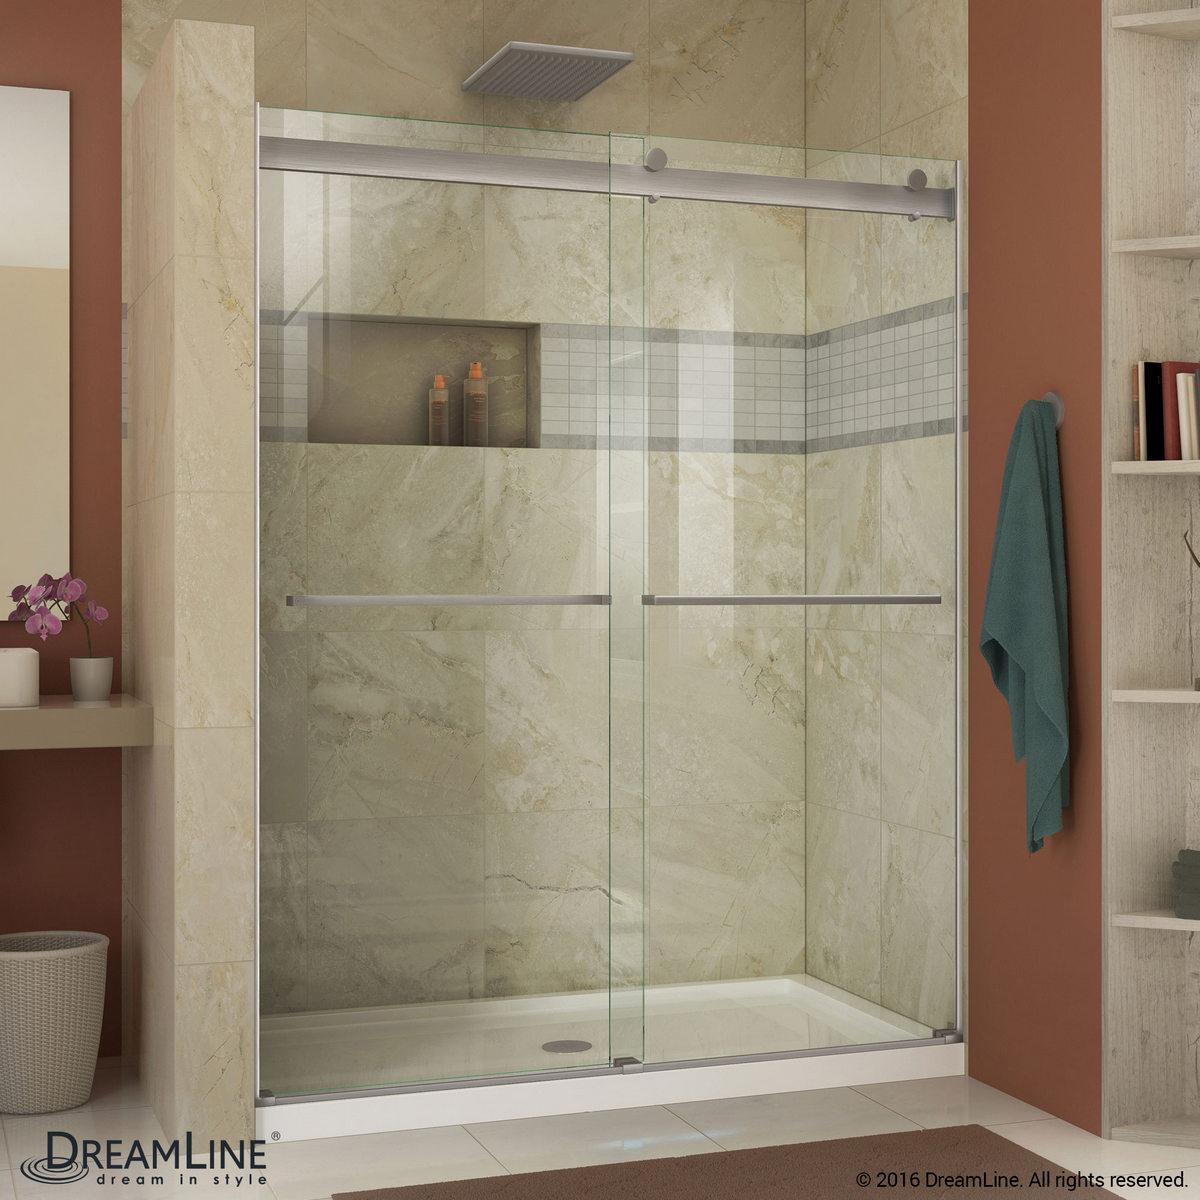 Dreamline Essence 56 To 60 In Frameless Bypass Shower Door Brushed